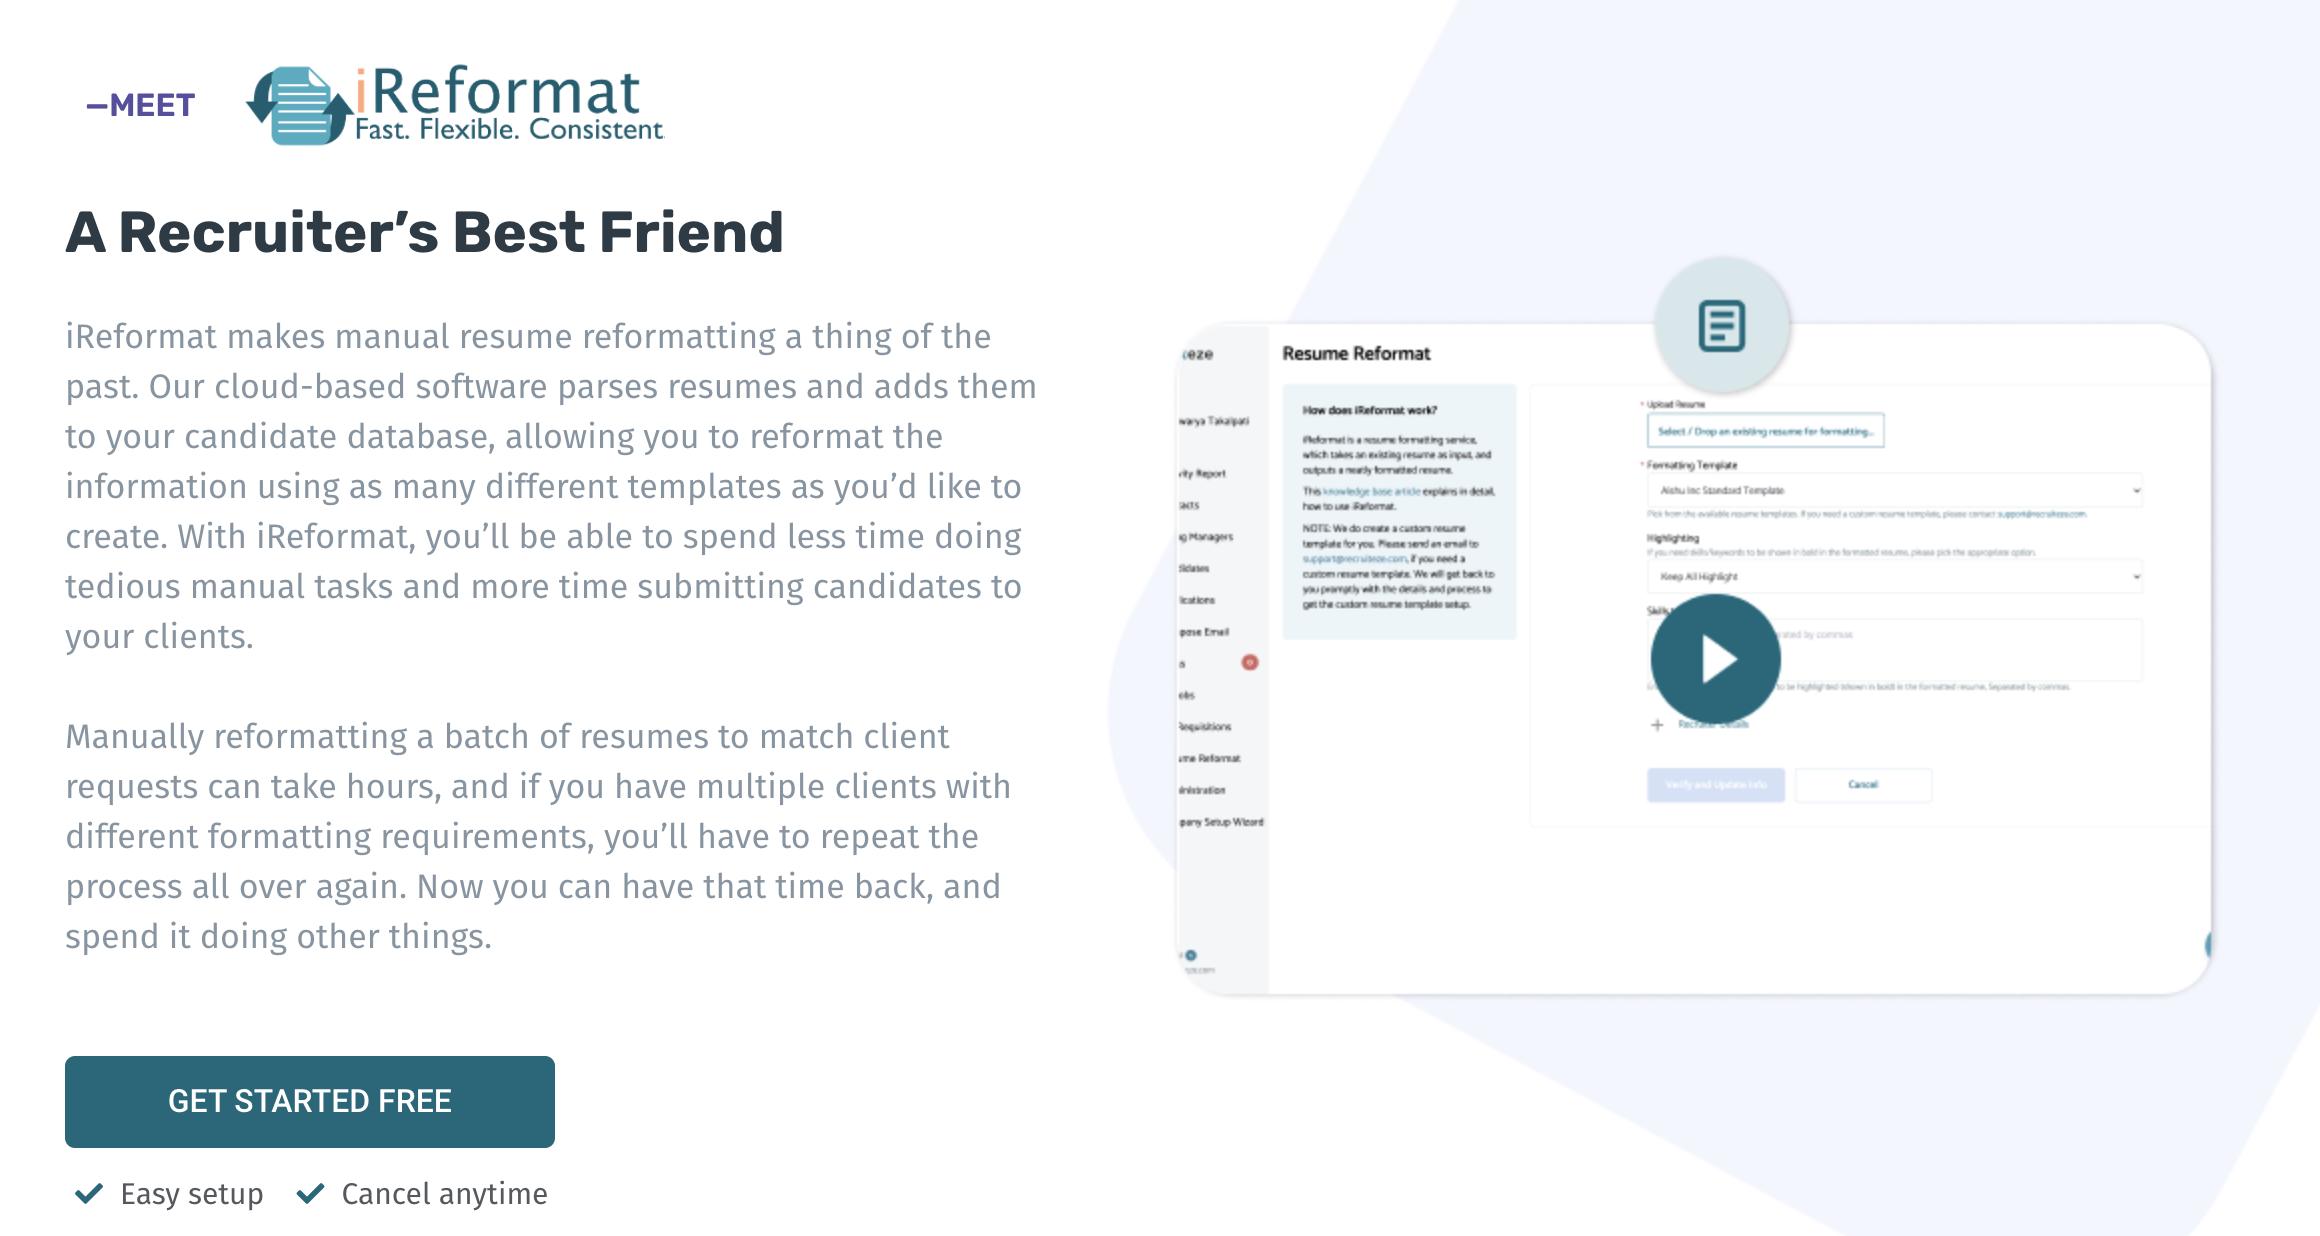 iReformat - A recruiter's best friend (benefits)